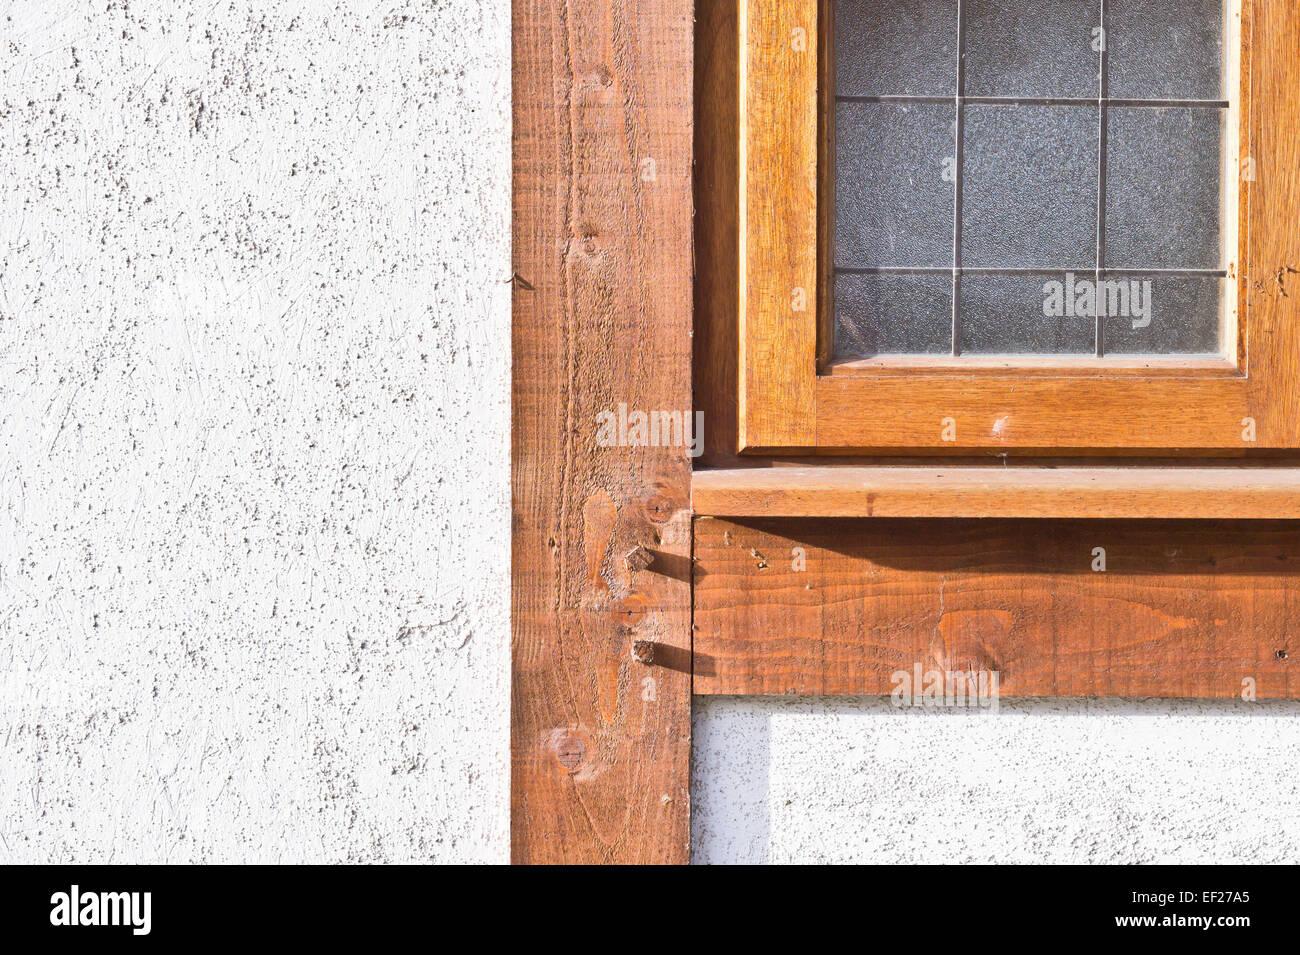 Wooden Window Frame Stockfotos & Wooden Window Frame Bilder - Alamy